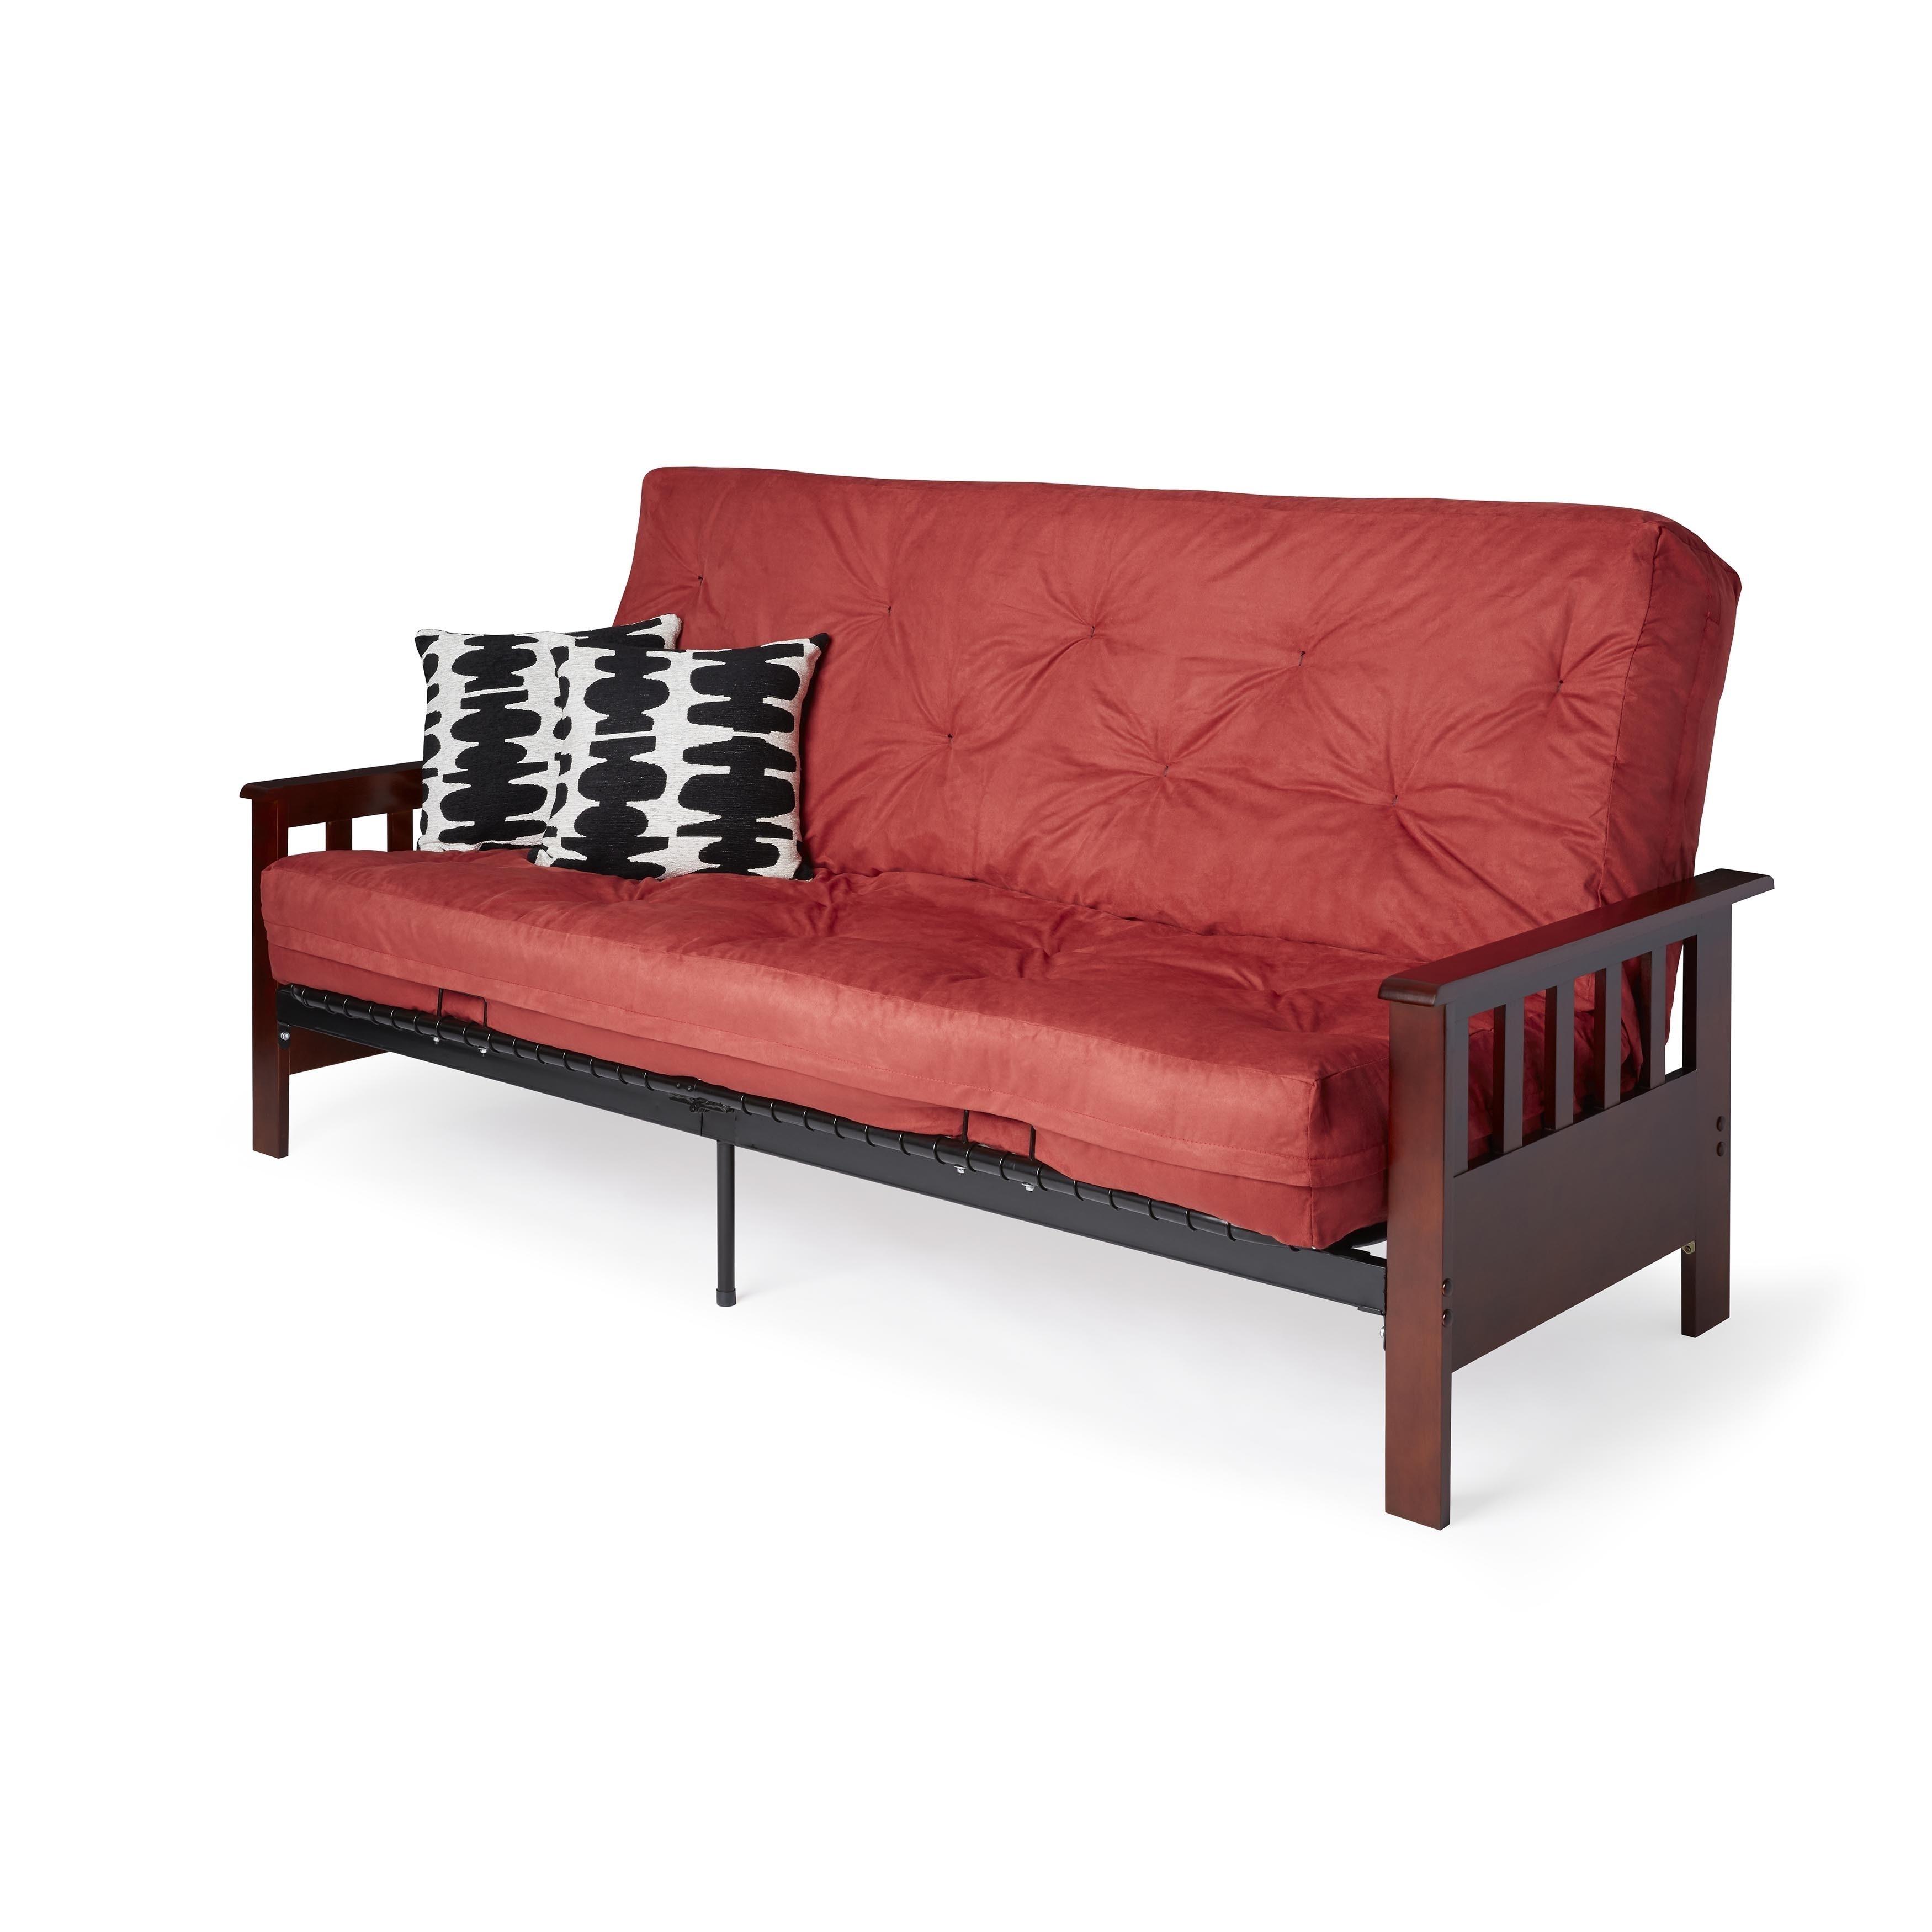 Provo Mission style Futon Sofa Sleeper Frame Free Shipping Today